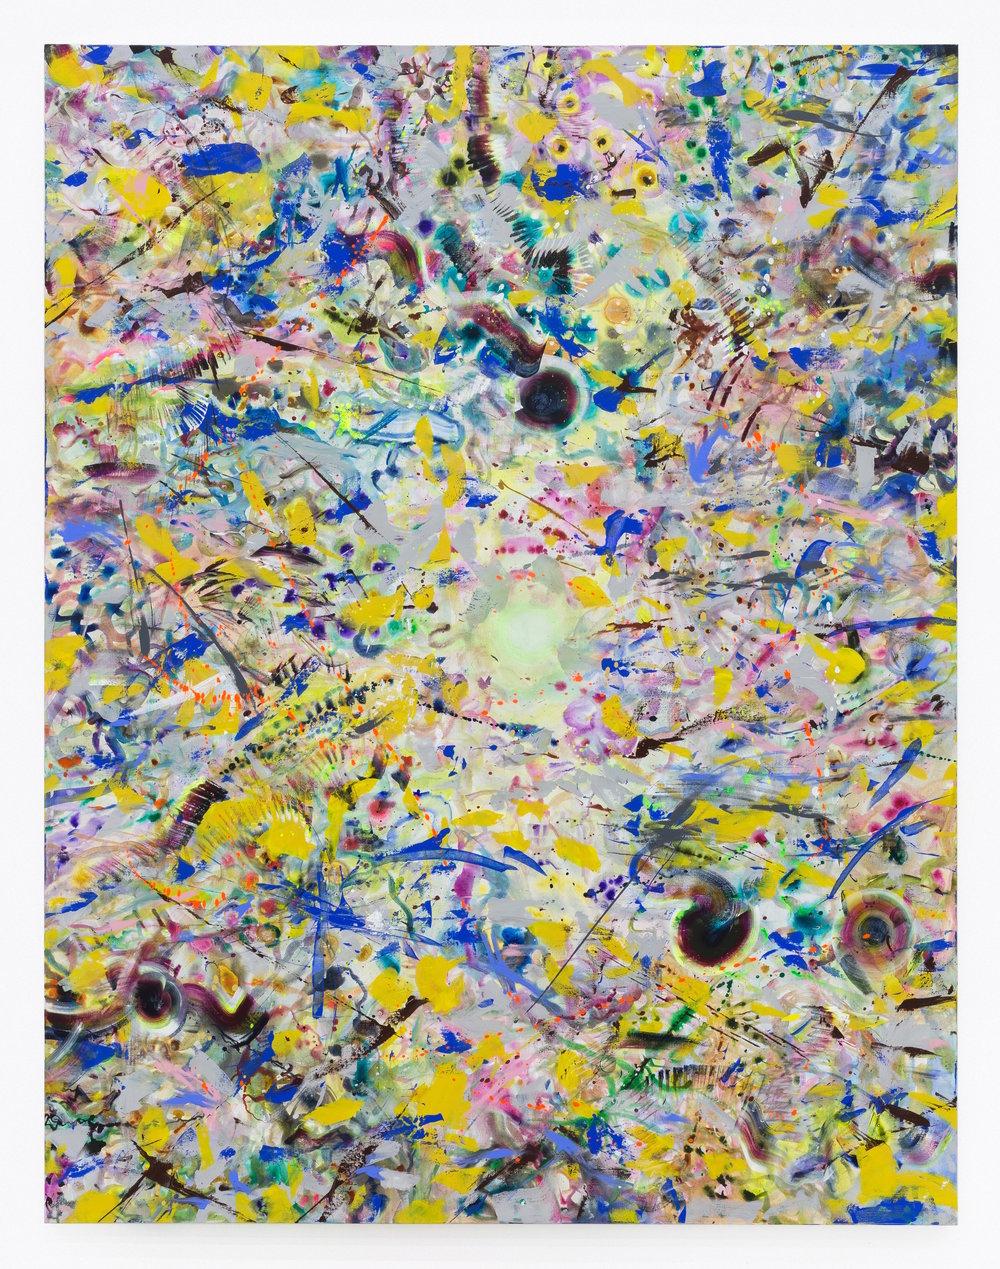 Wang Haiyang,  Untouchable #9 , 2017, Acrylic on canvas, 260 x 200 cm.